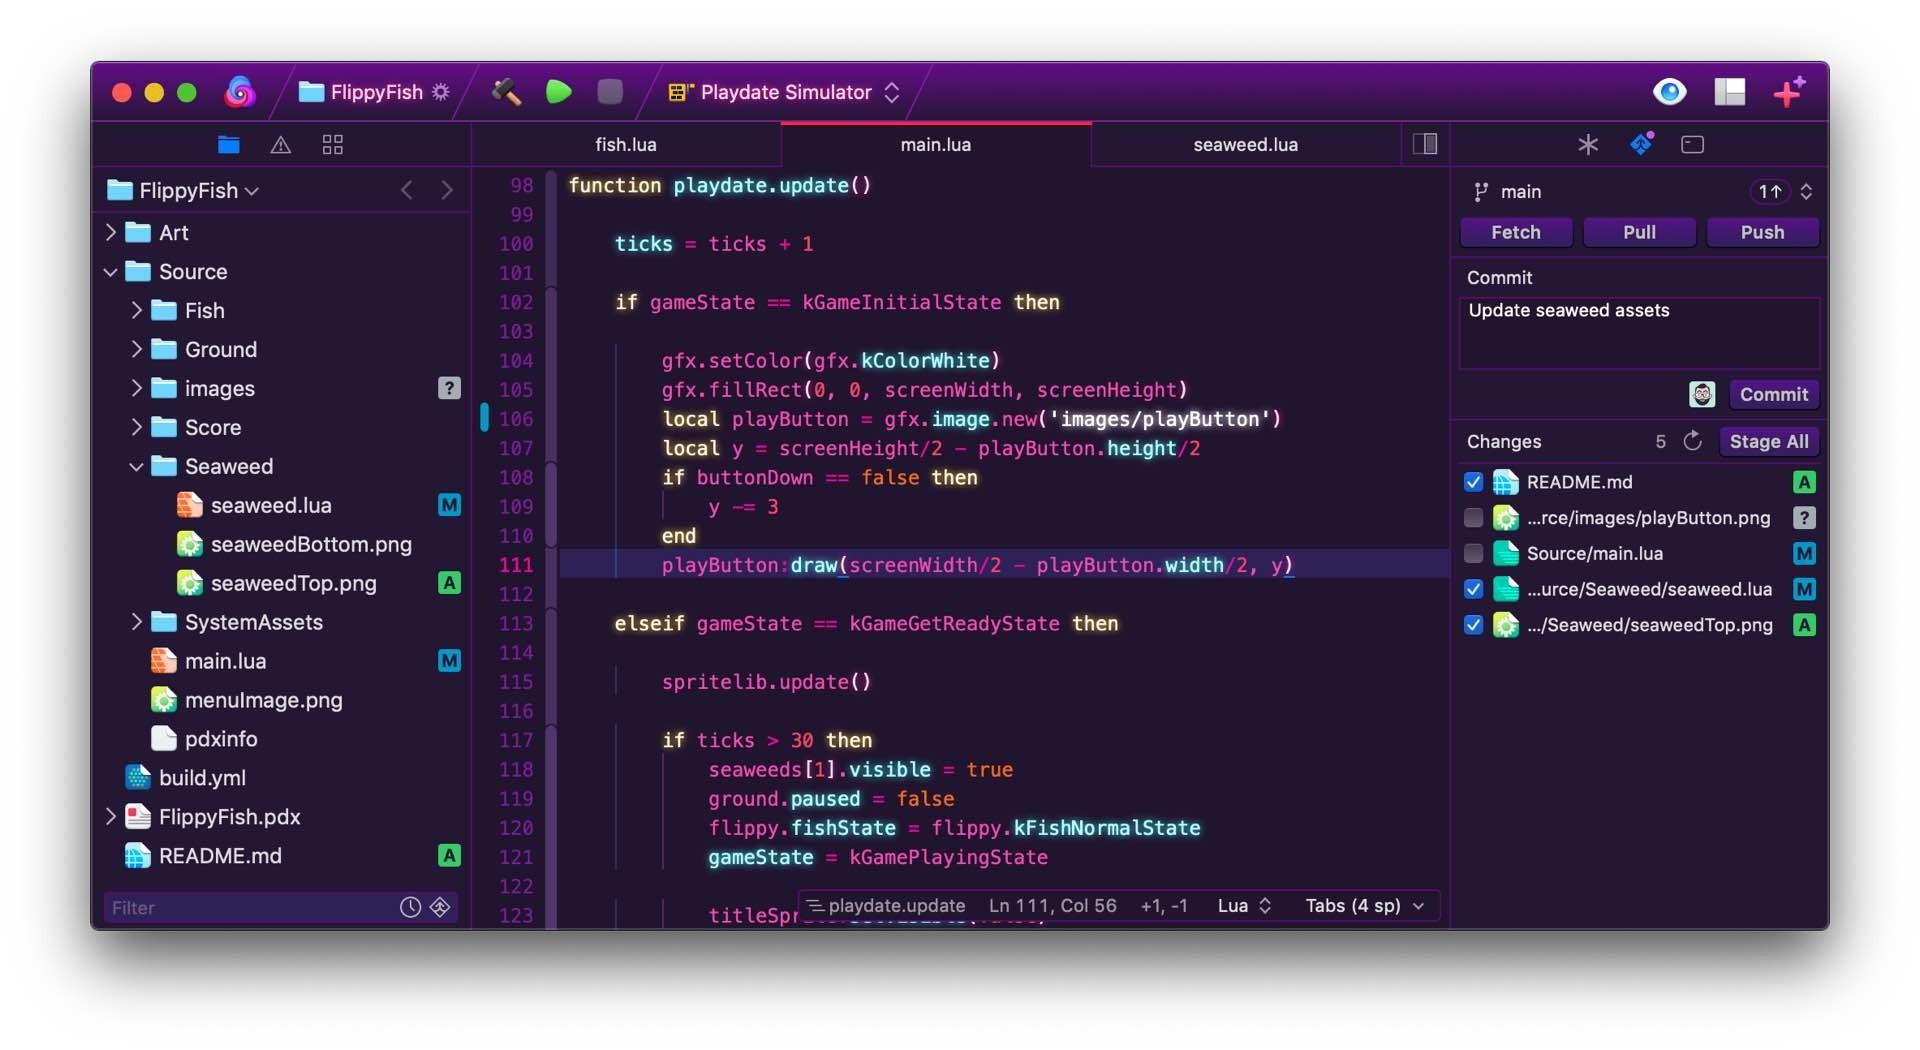 nova-code-editor-for-mac-by-panic-3